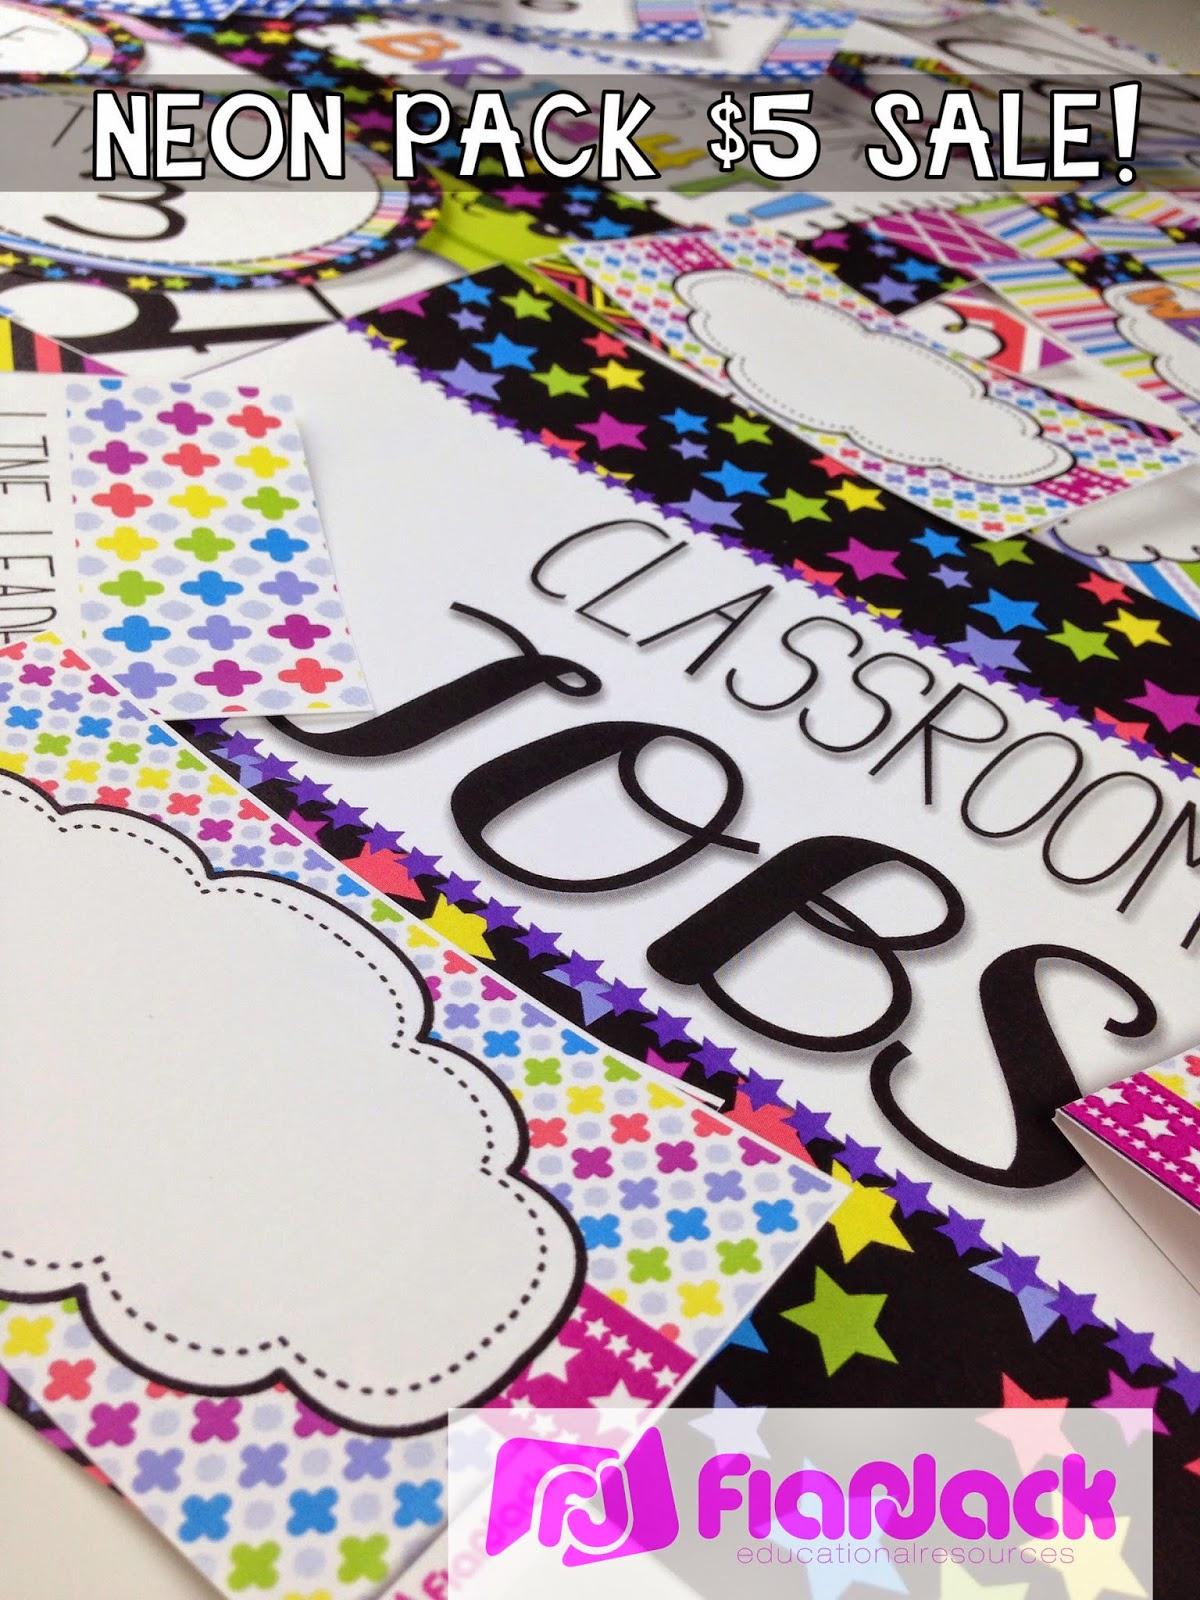 Classroom Decor For Sale ~ Neon classroom decor pack off sale